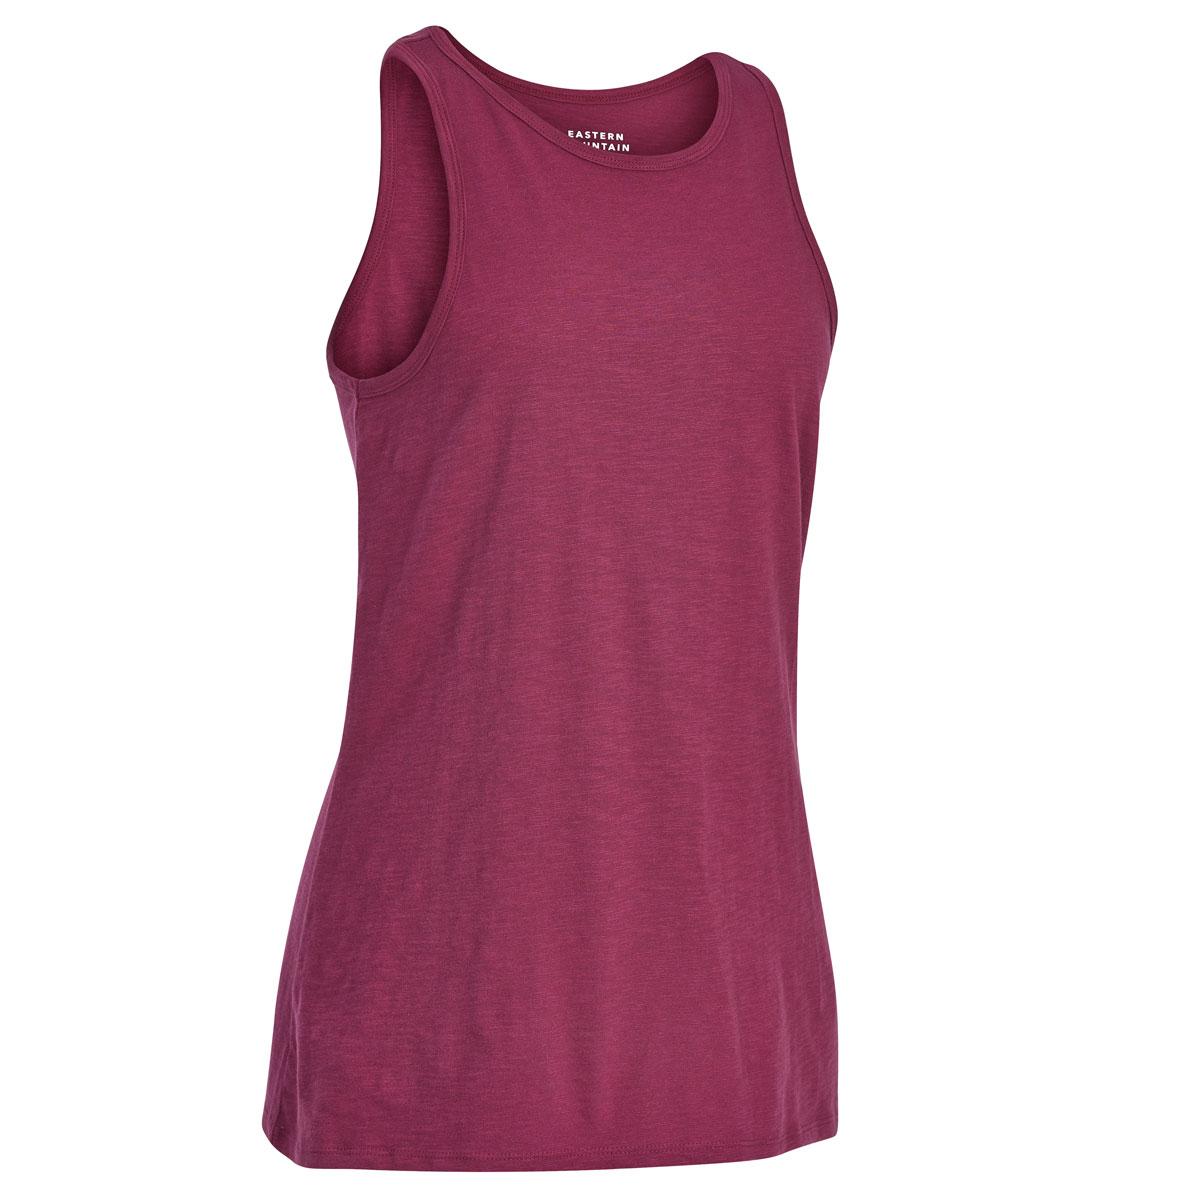 Ems Women's Solid Organic Slub Tank Top - Red, L